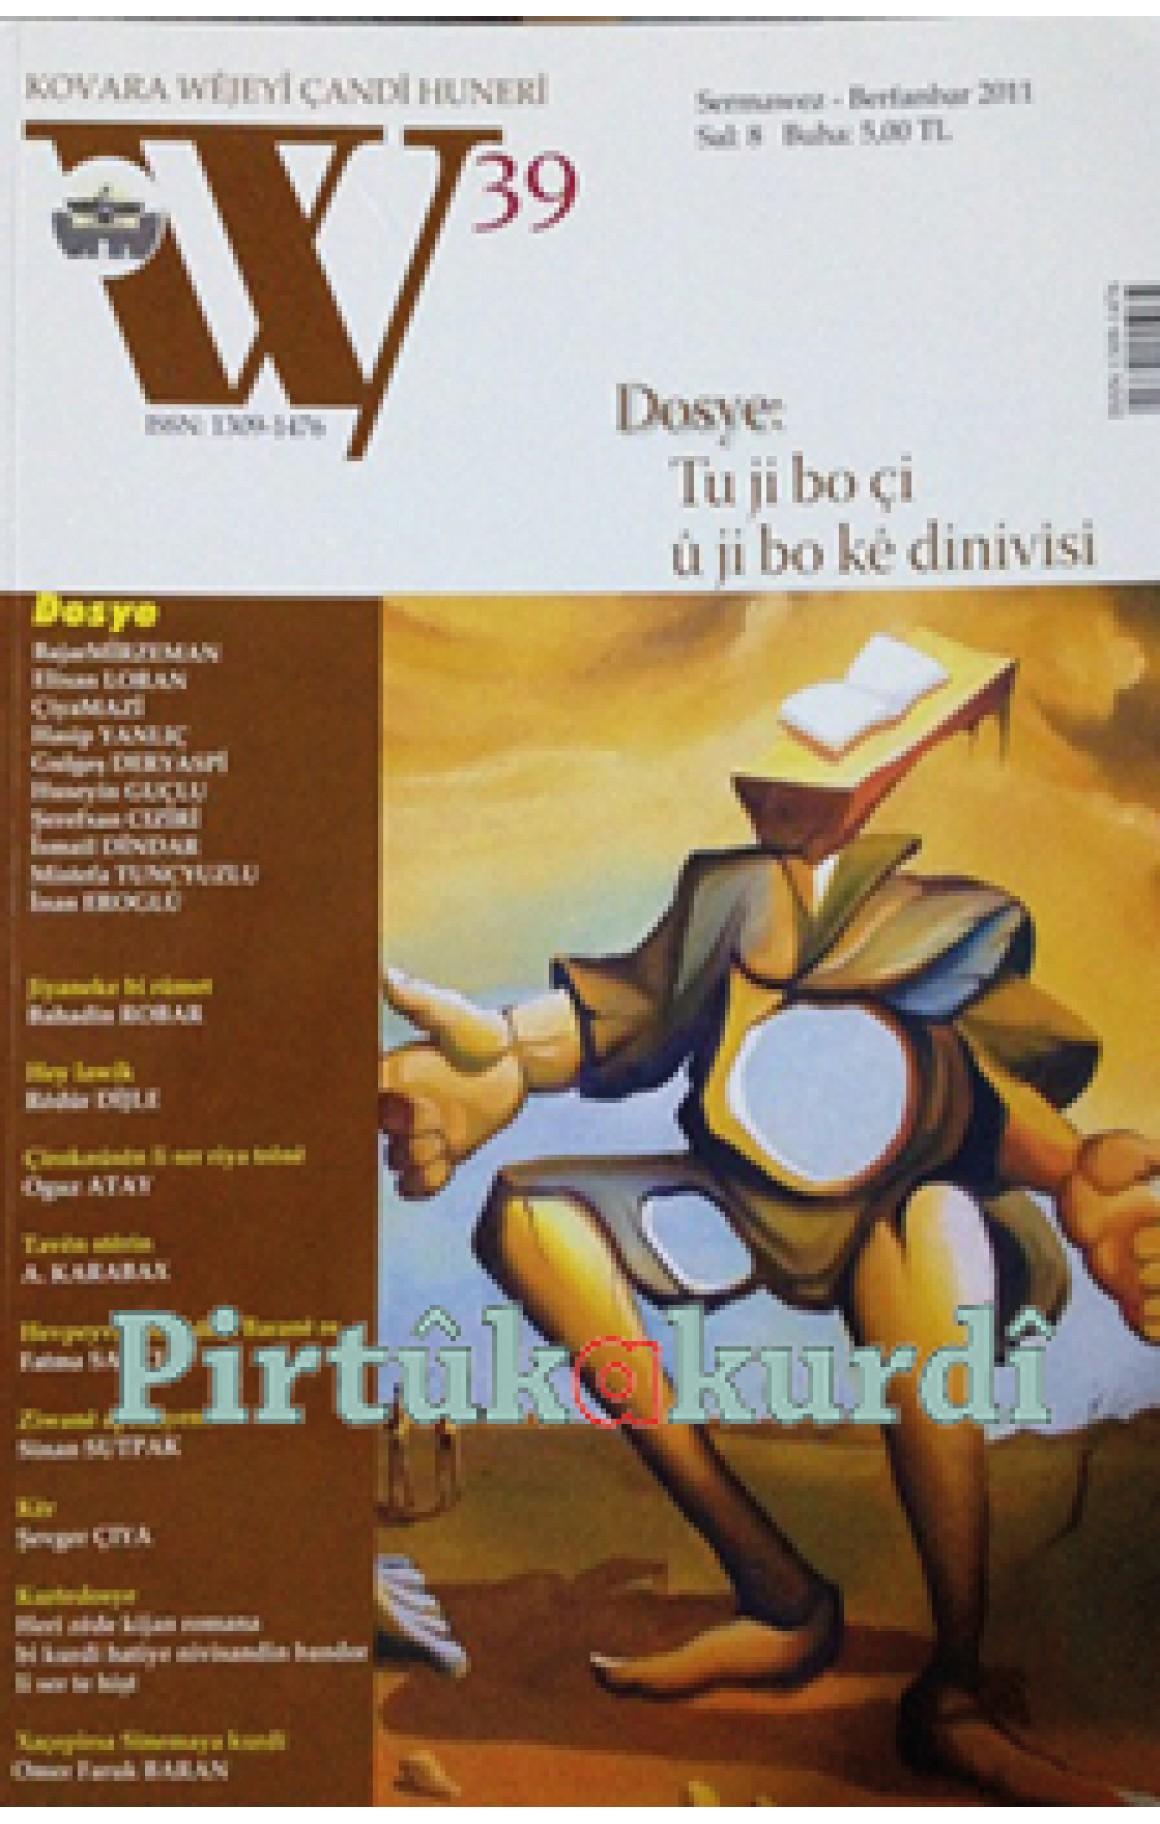 Kovara W 39